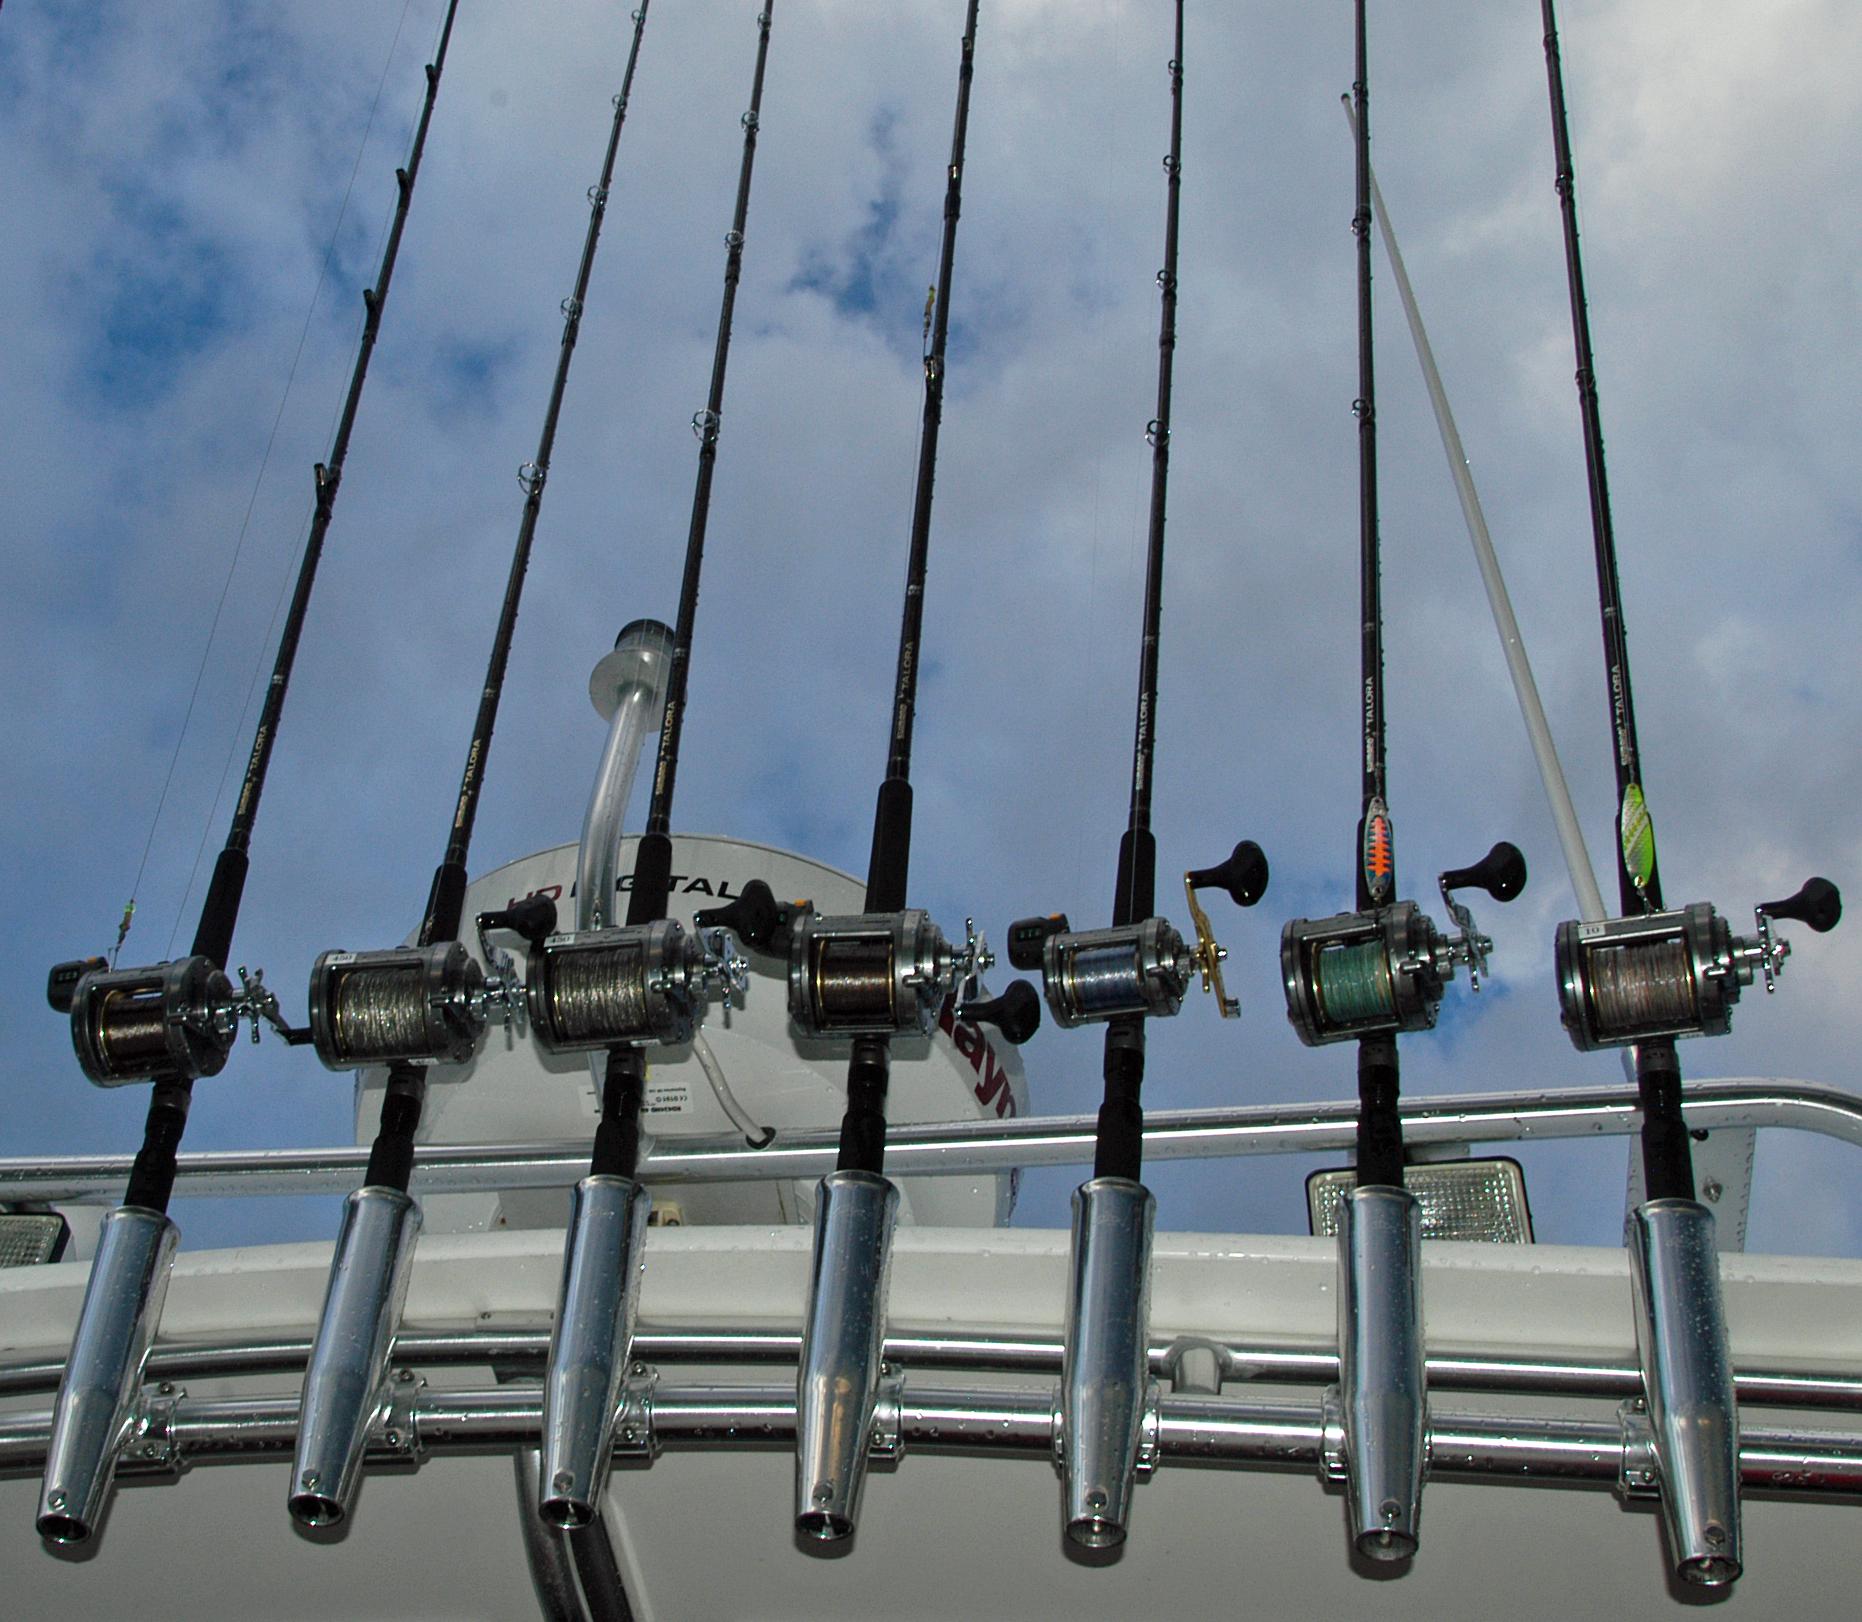 Lake michigan s charter fishing catch rate slips in 2013 for Southwest michigan fishing report